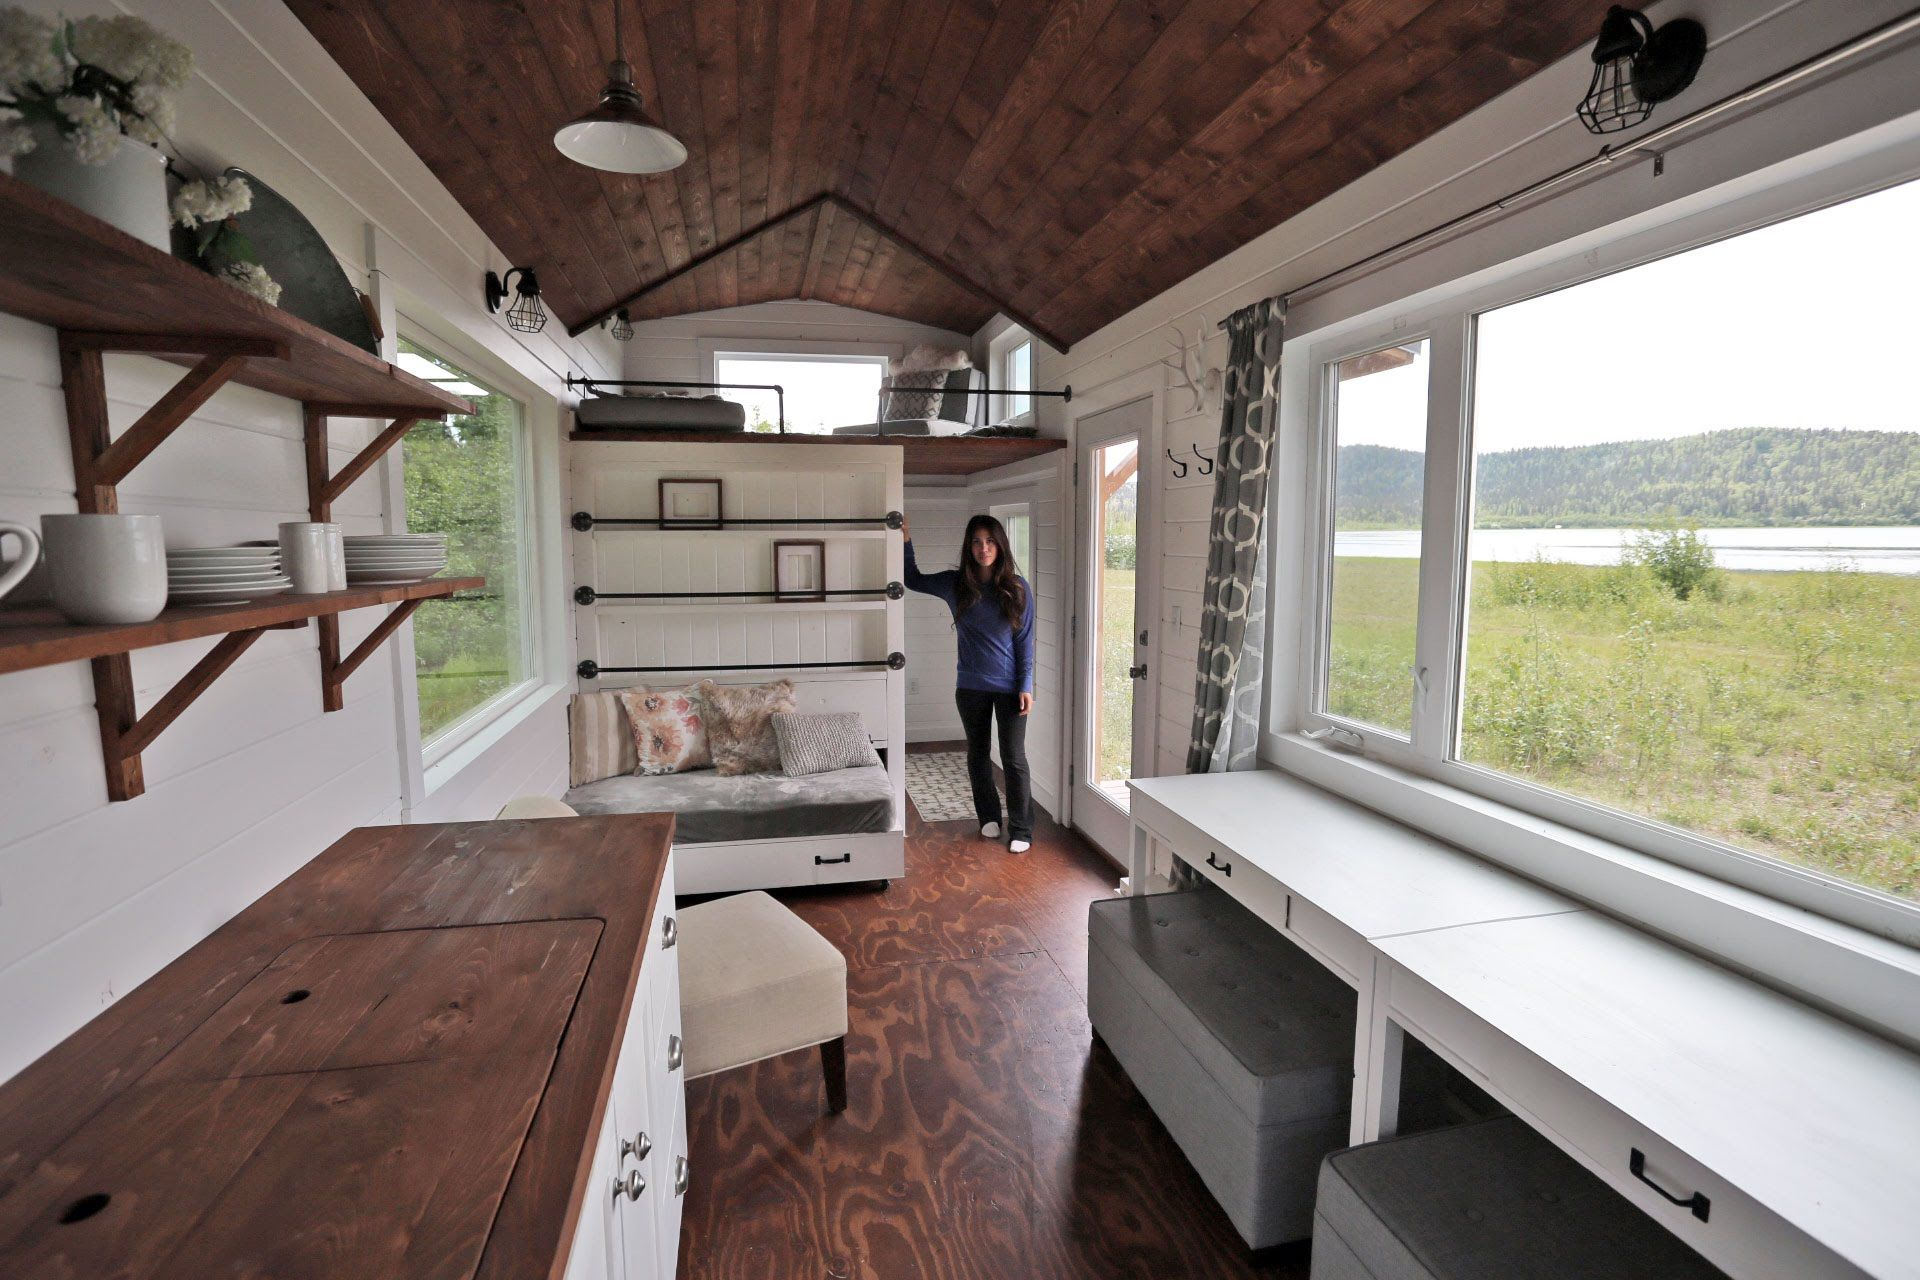 Beautiful 24 Foot Tiny House Tour with Free Plans: Ana White Tiny House ...